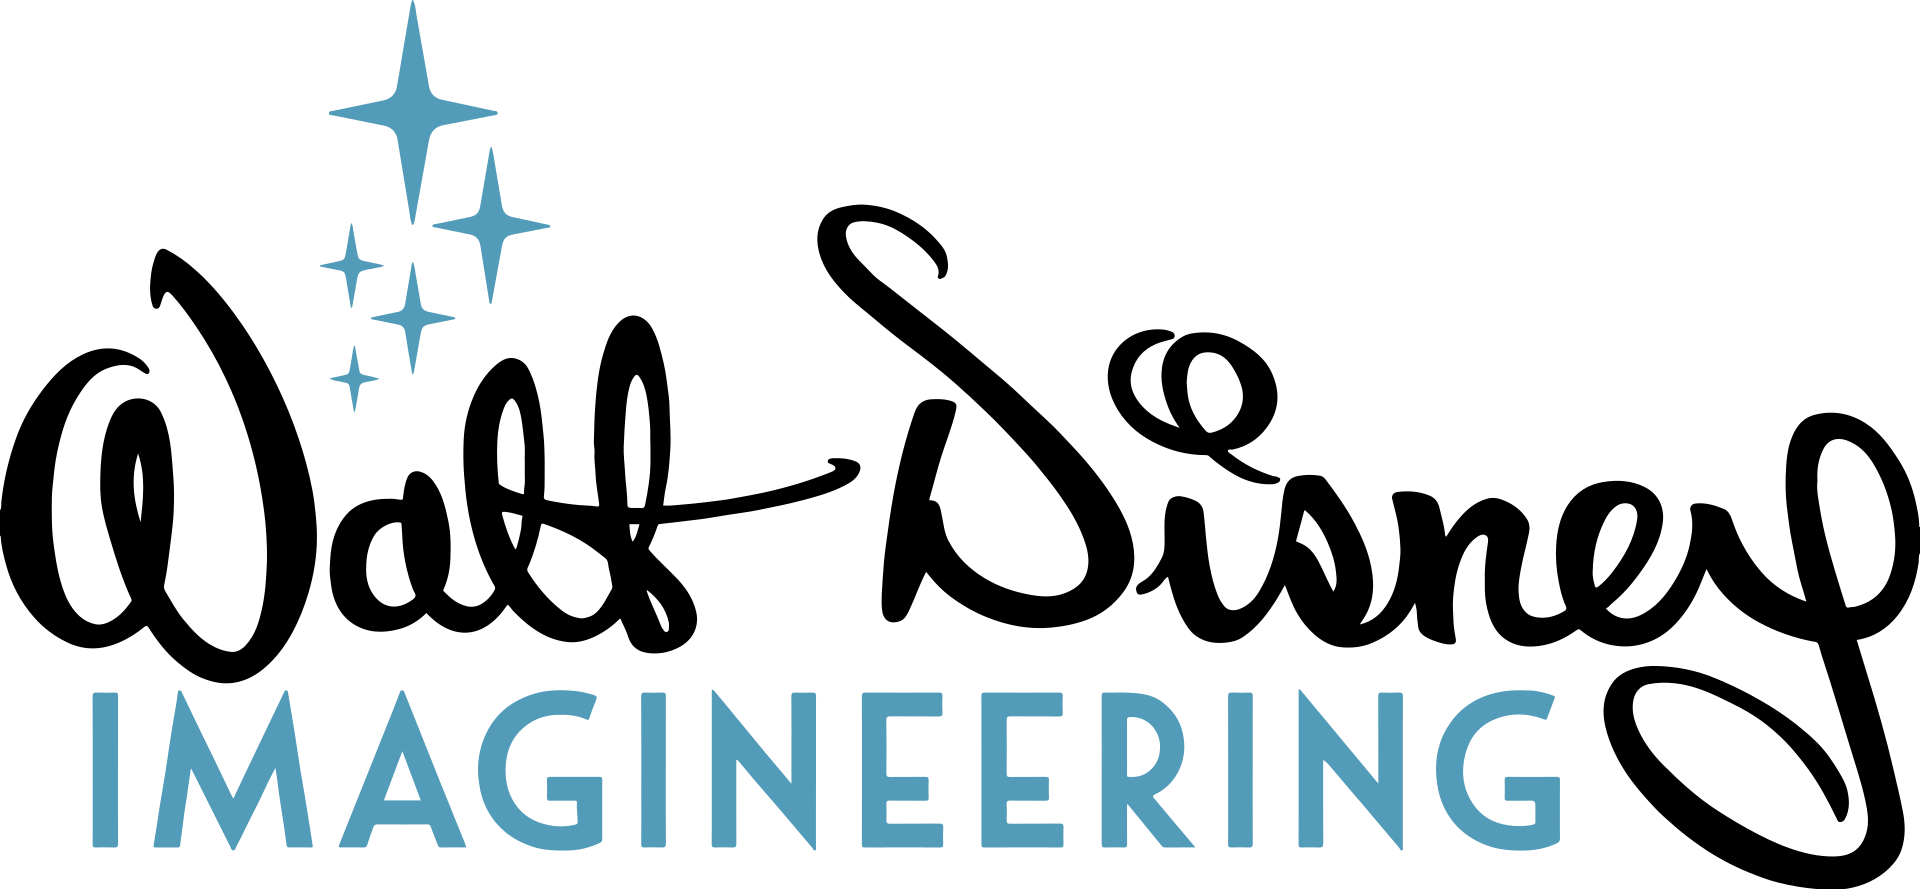 Walt_Disney_Imagineering_logo